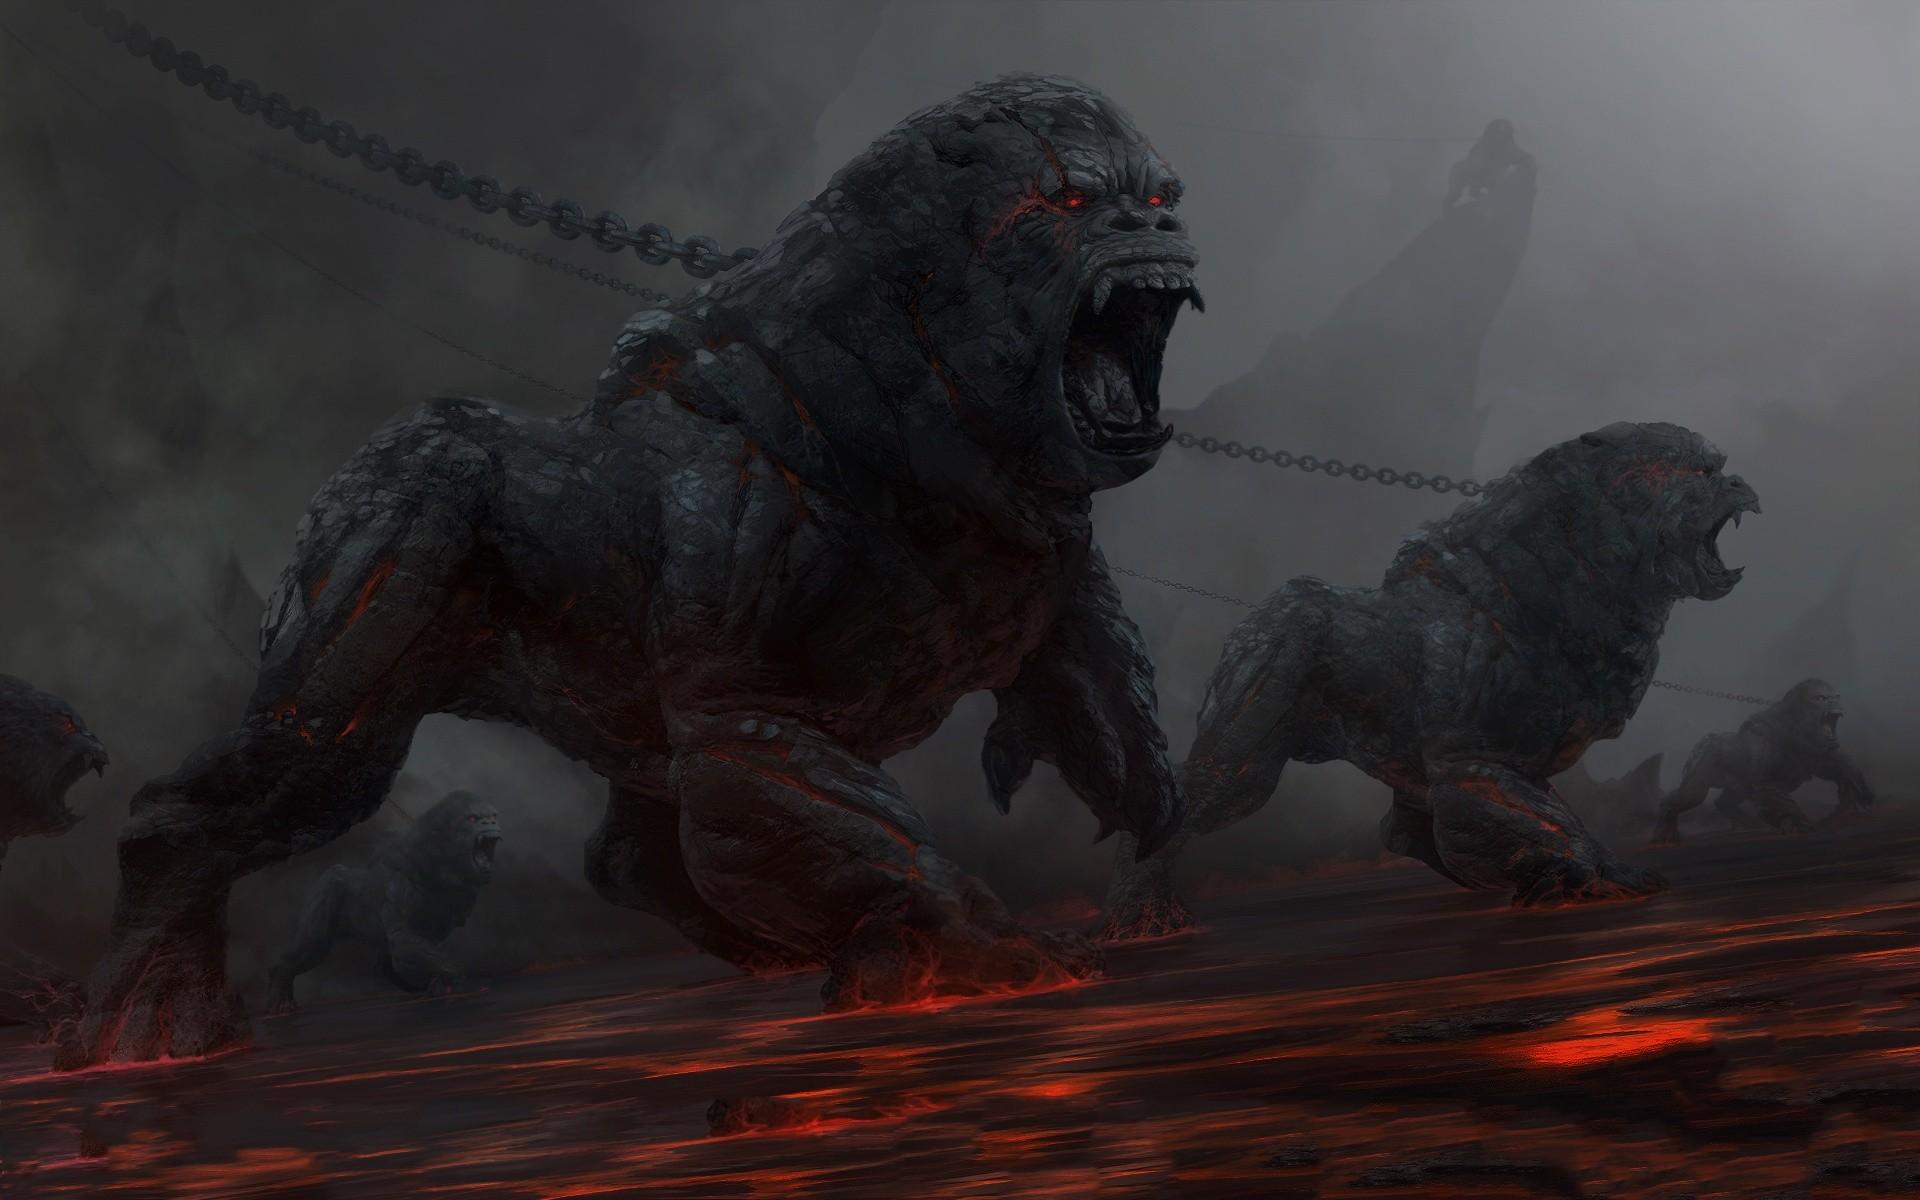 Res: 1920x1200, Fantasy art dark horror evil demons gorilla animals fire hell chains  monsters beast creature eyes scream roar landscapes scary wallpaper |   | 32287 ...